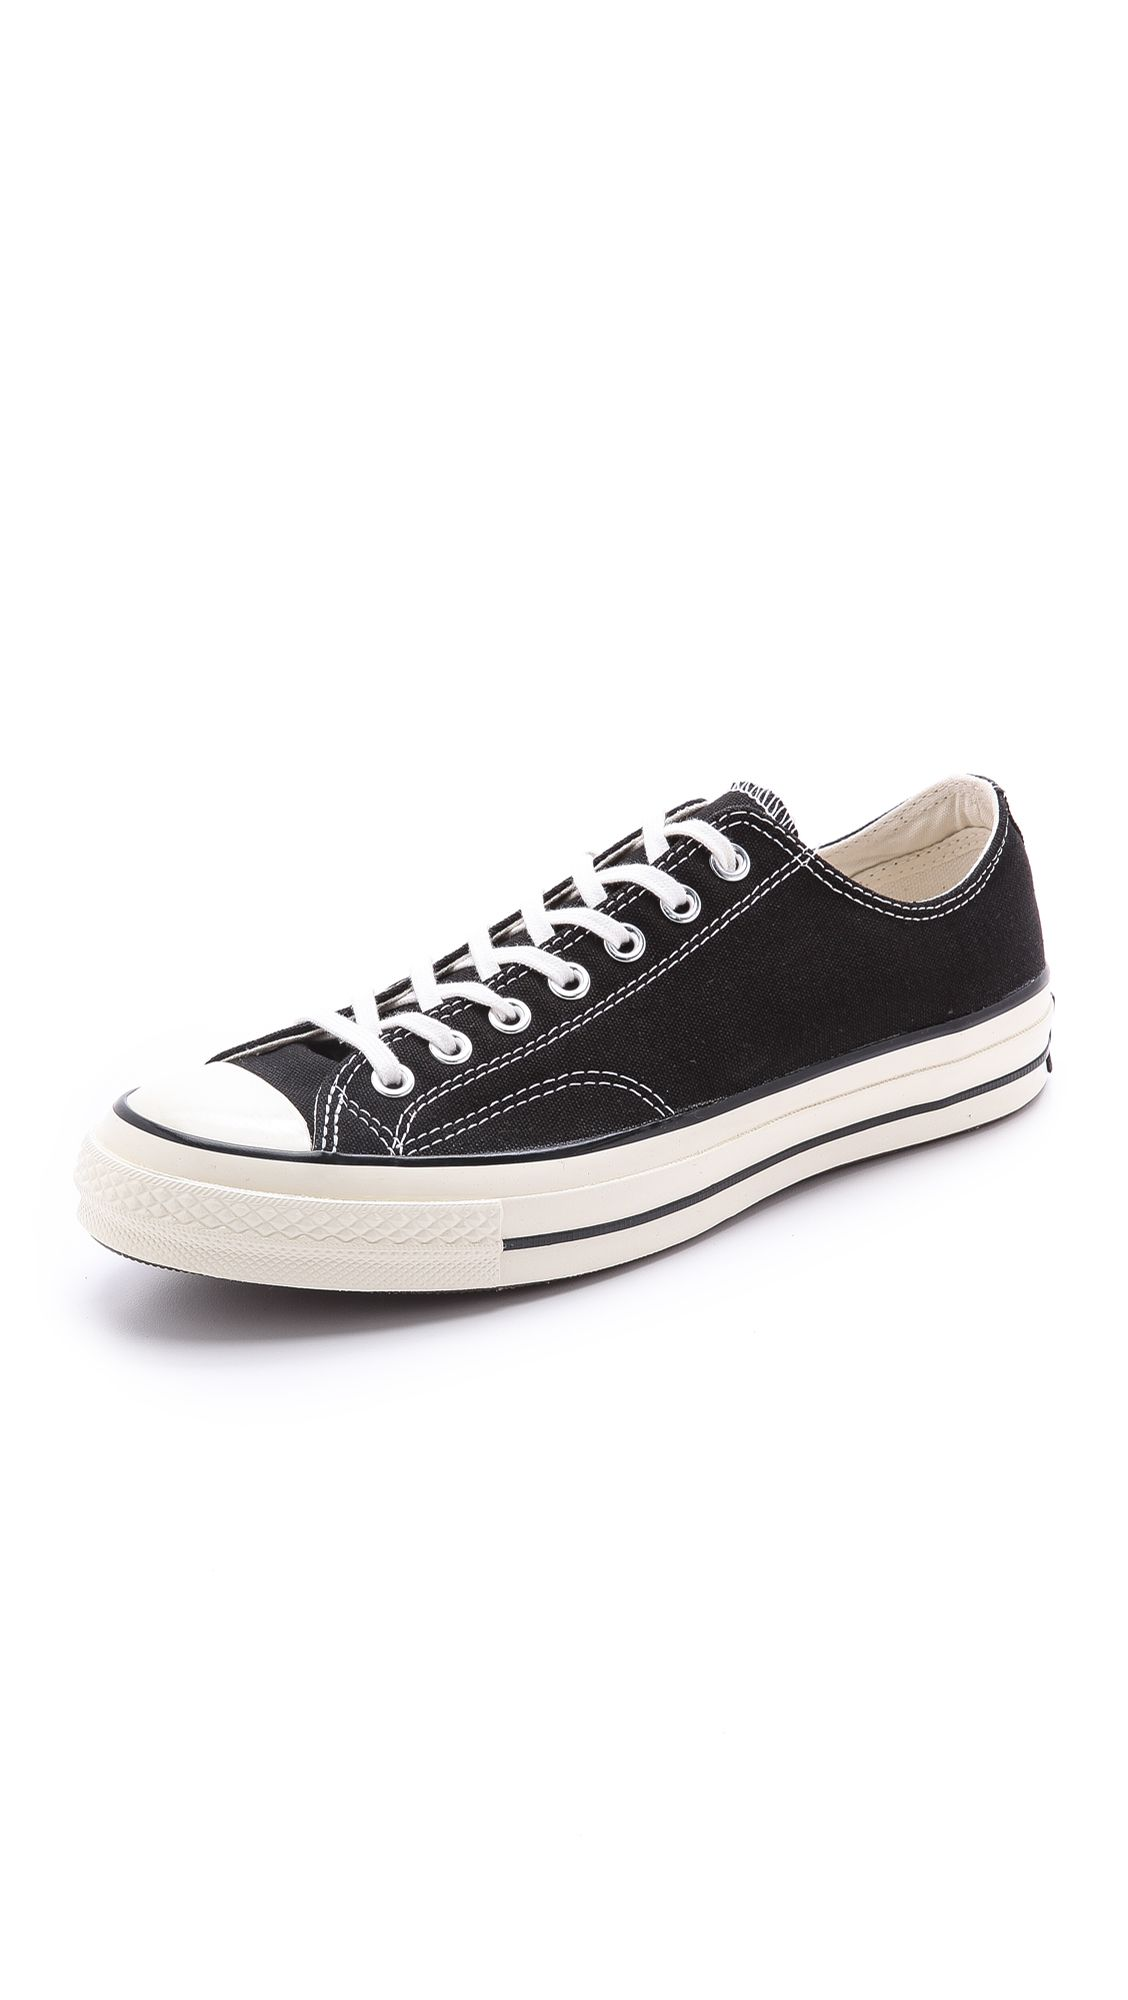 e67ff0e0a3b75f CONVERSE Chuck Taylor All Star  70S Sneakers.  converse  shoes  sneakers